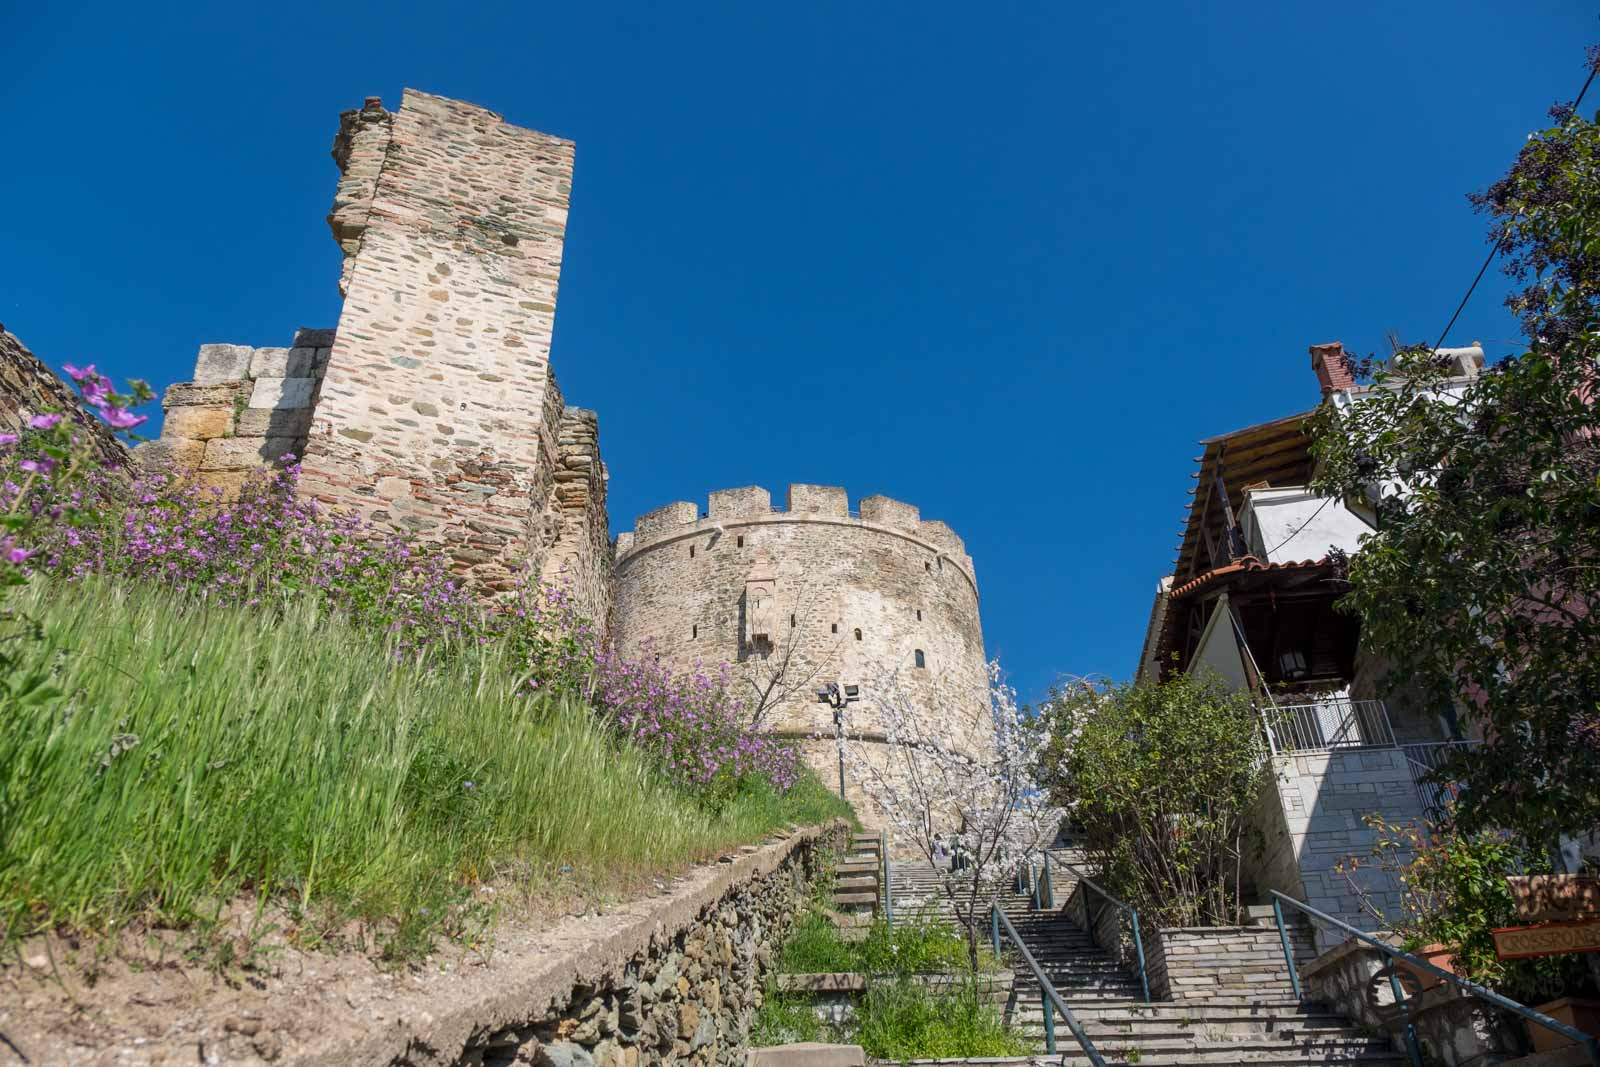 Auf dem Trigoniou Tower